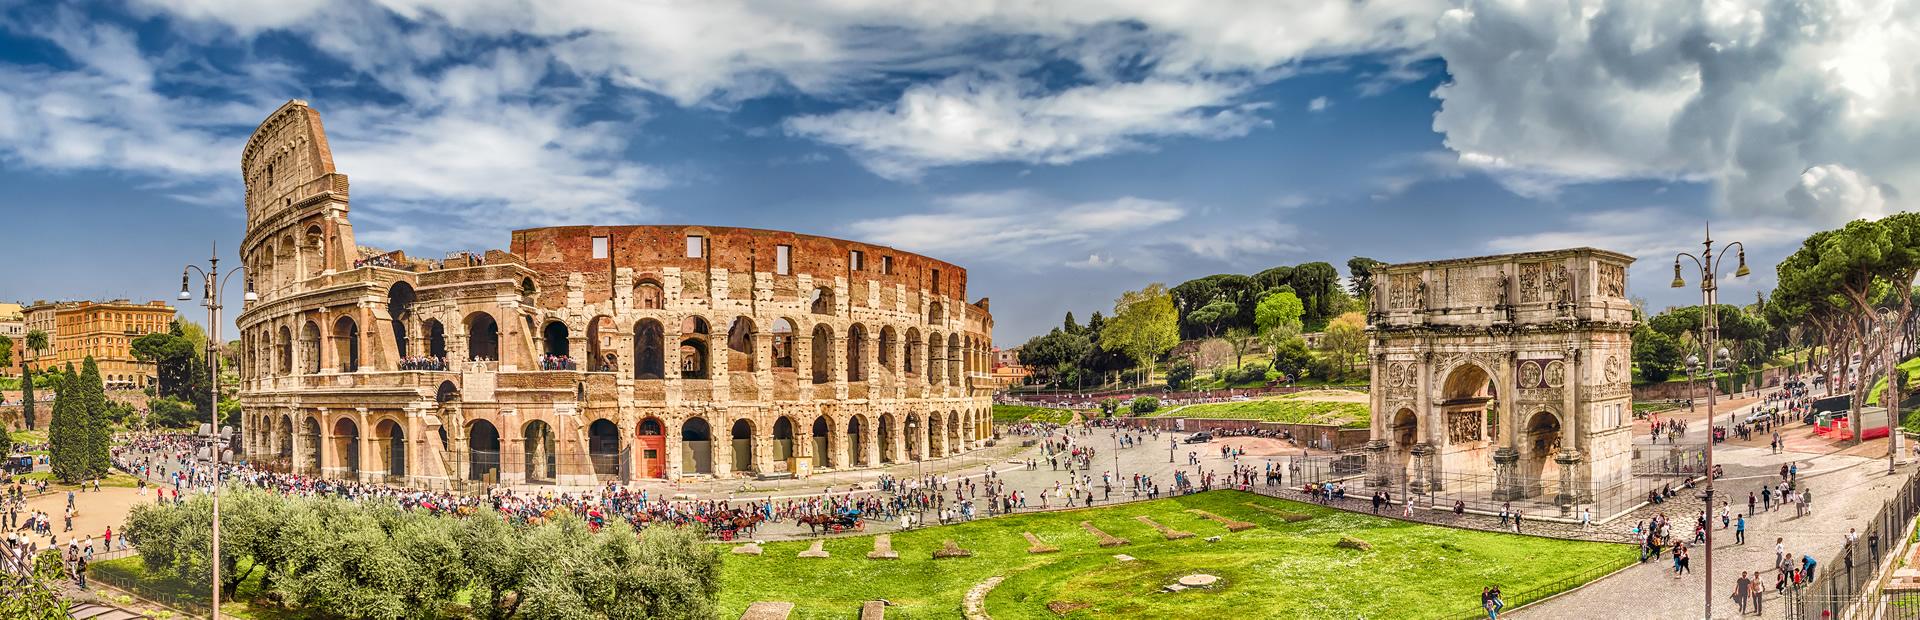 Collosseum in Rome nib International Travel Insurance 247